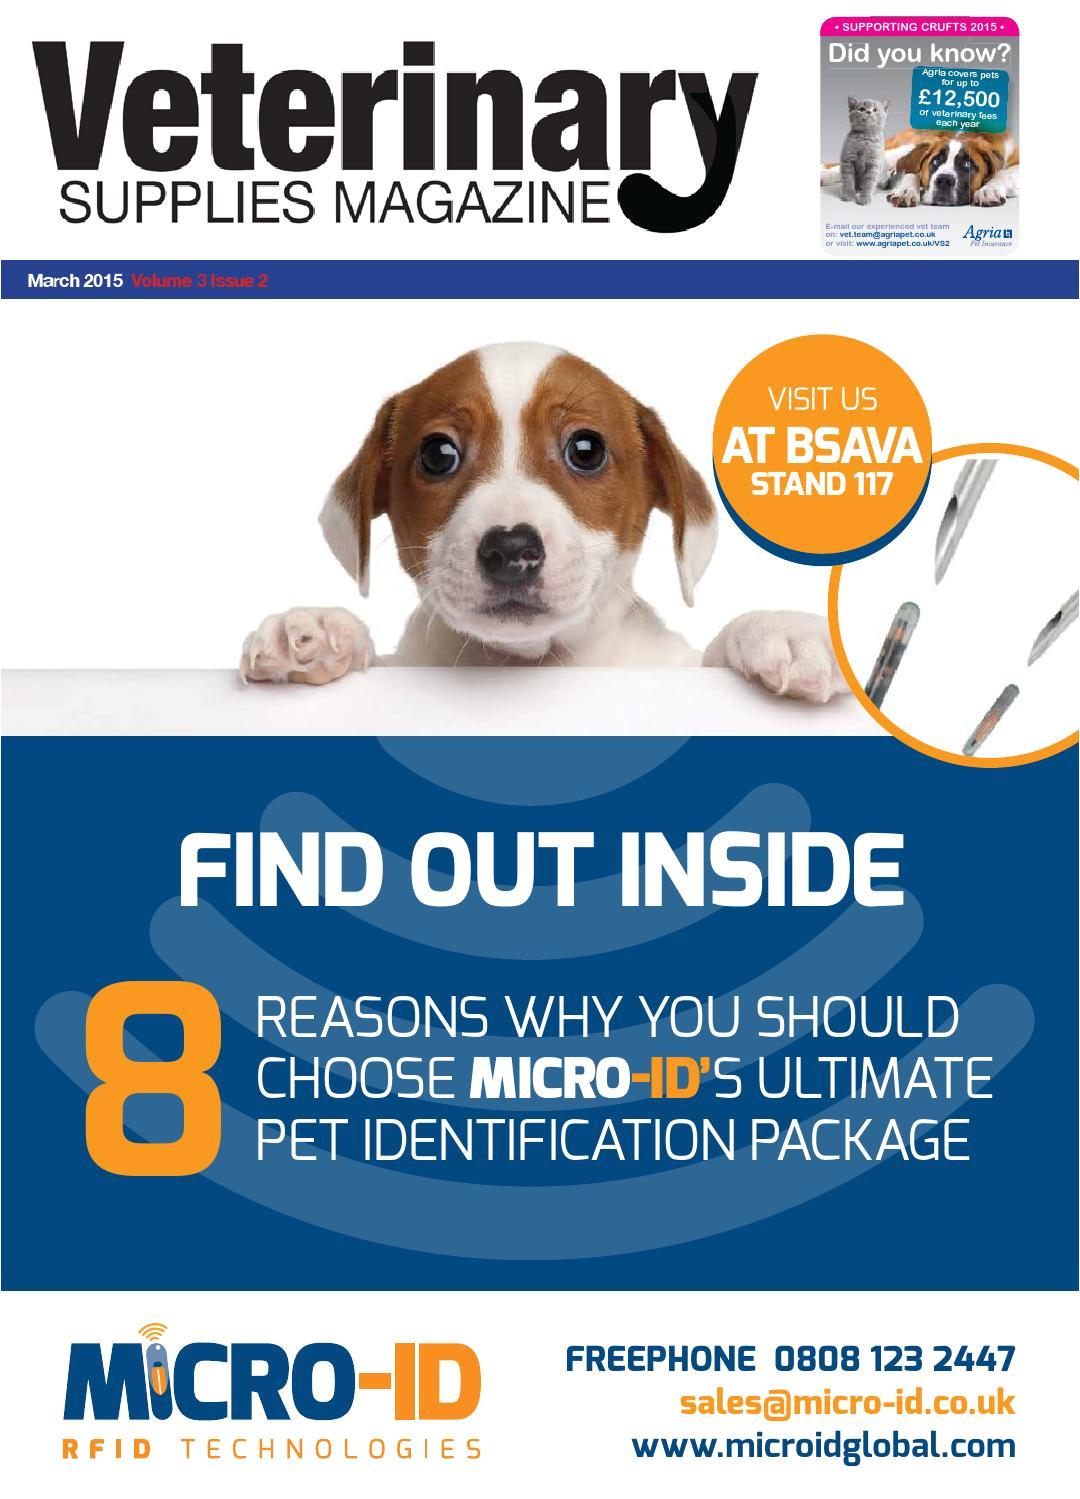 veterinary supplies magazine issue 3 2 by futurepublishingsolutions issuu